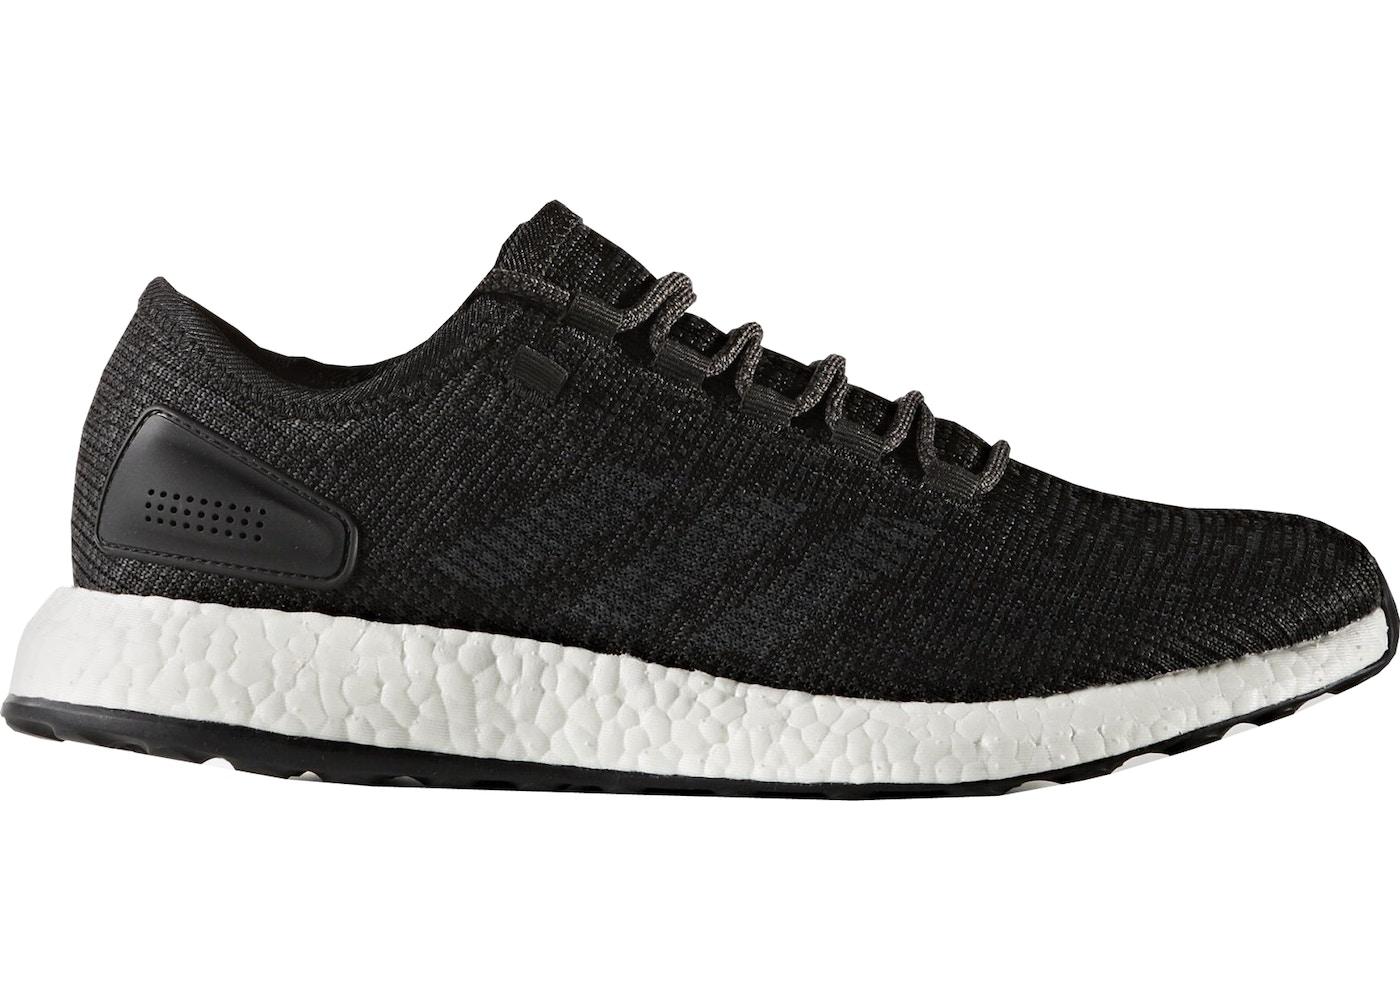 adidas PureBoost Core Black - BA8899